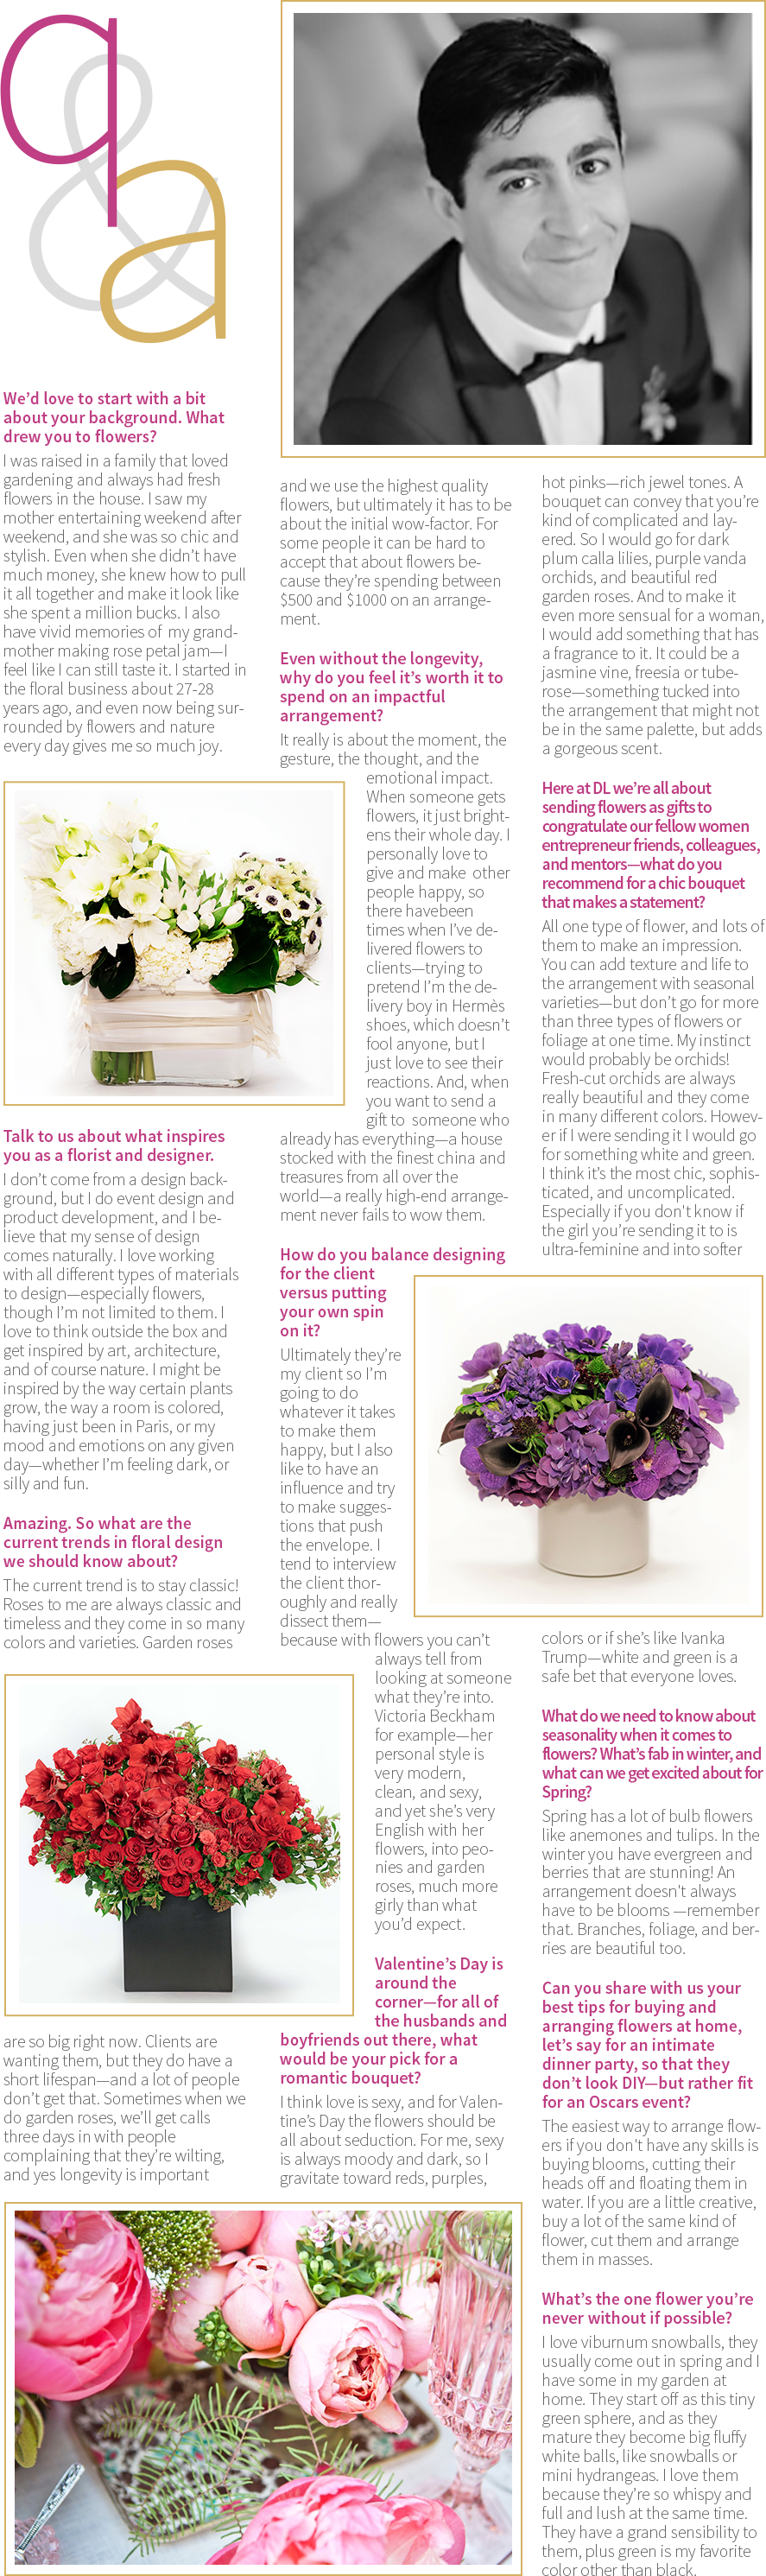 florist-story